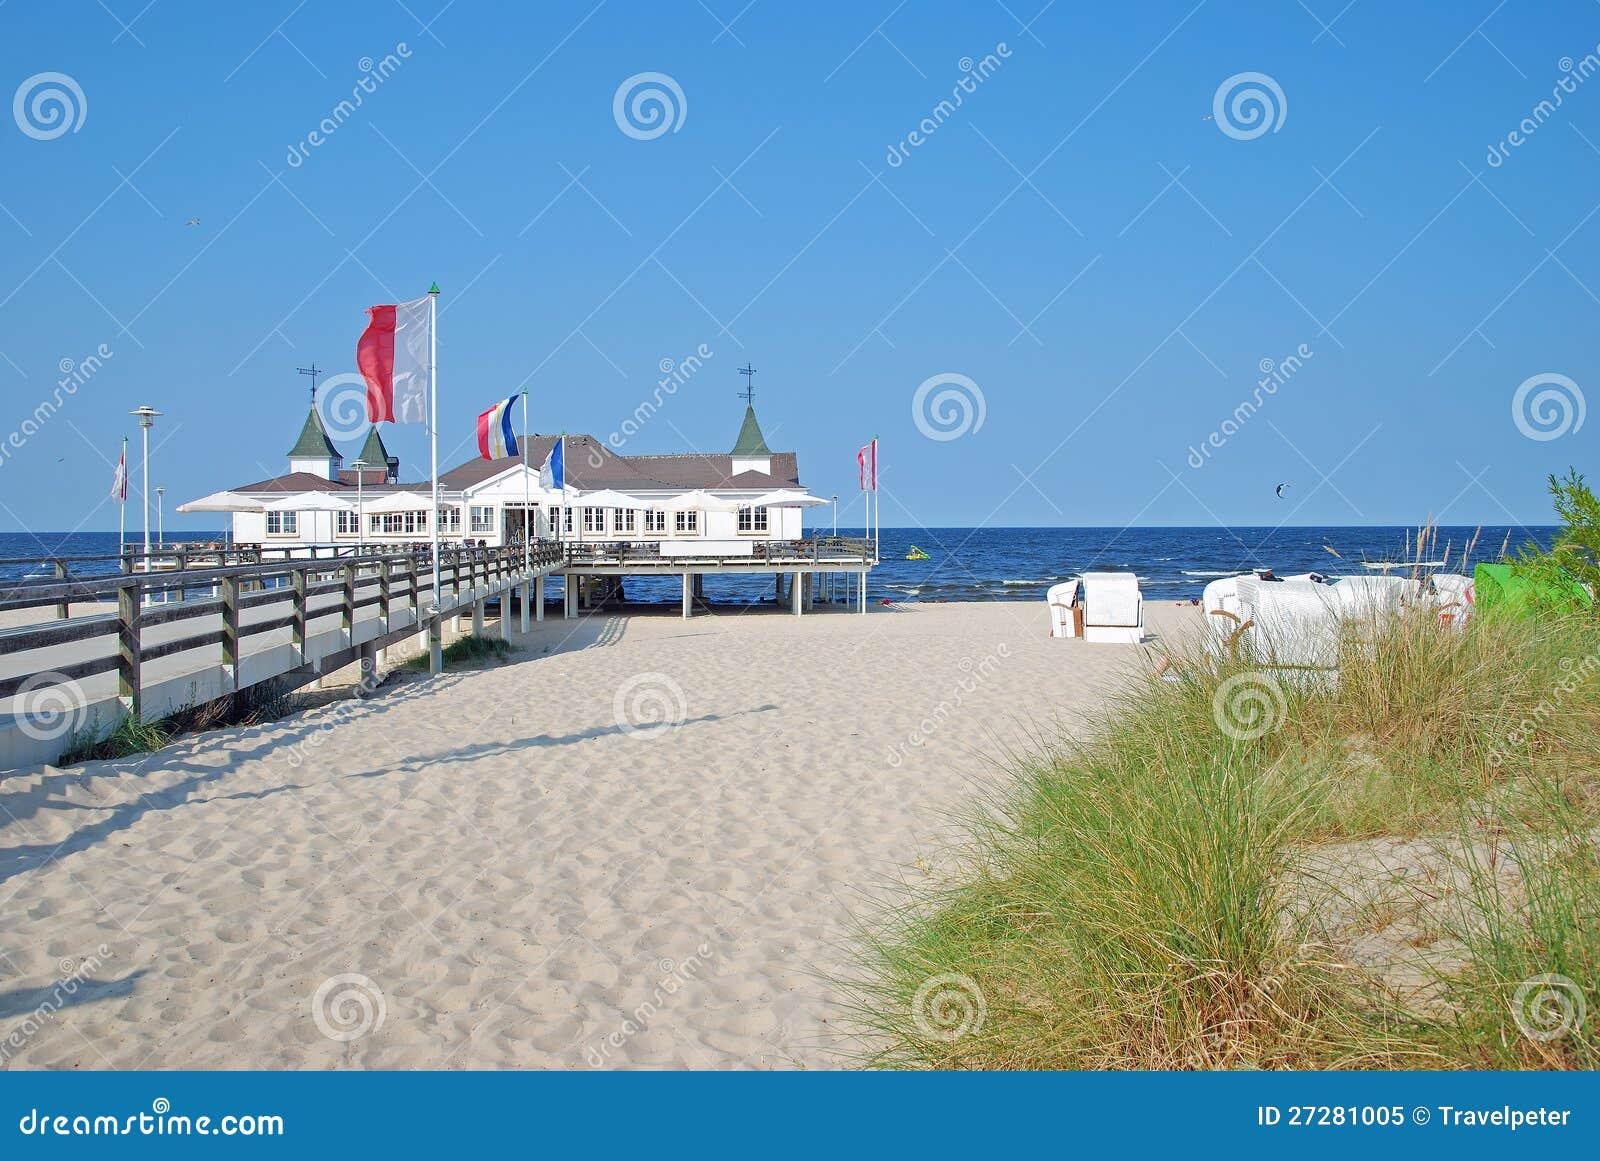 Ahlbeck, isla del usedom, mar Báltico, Alemania